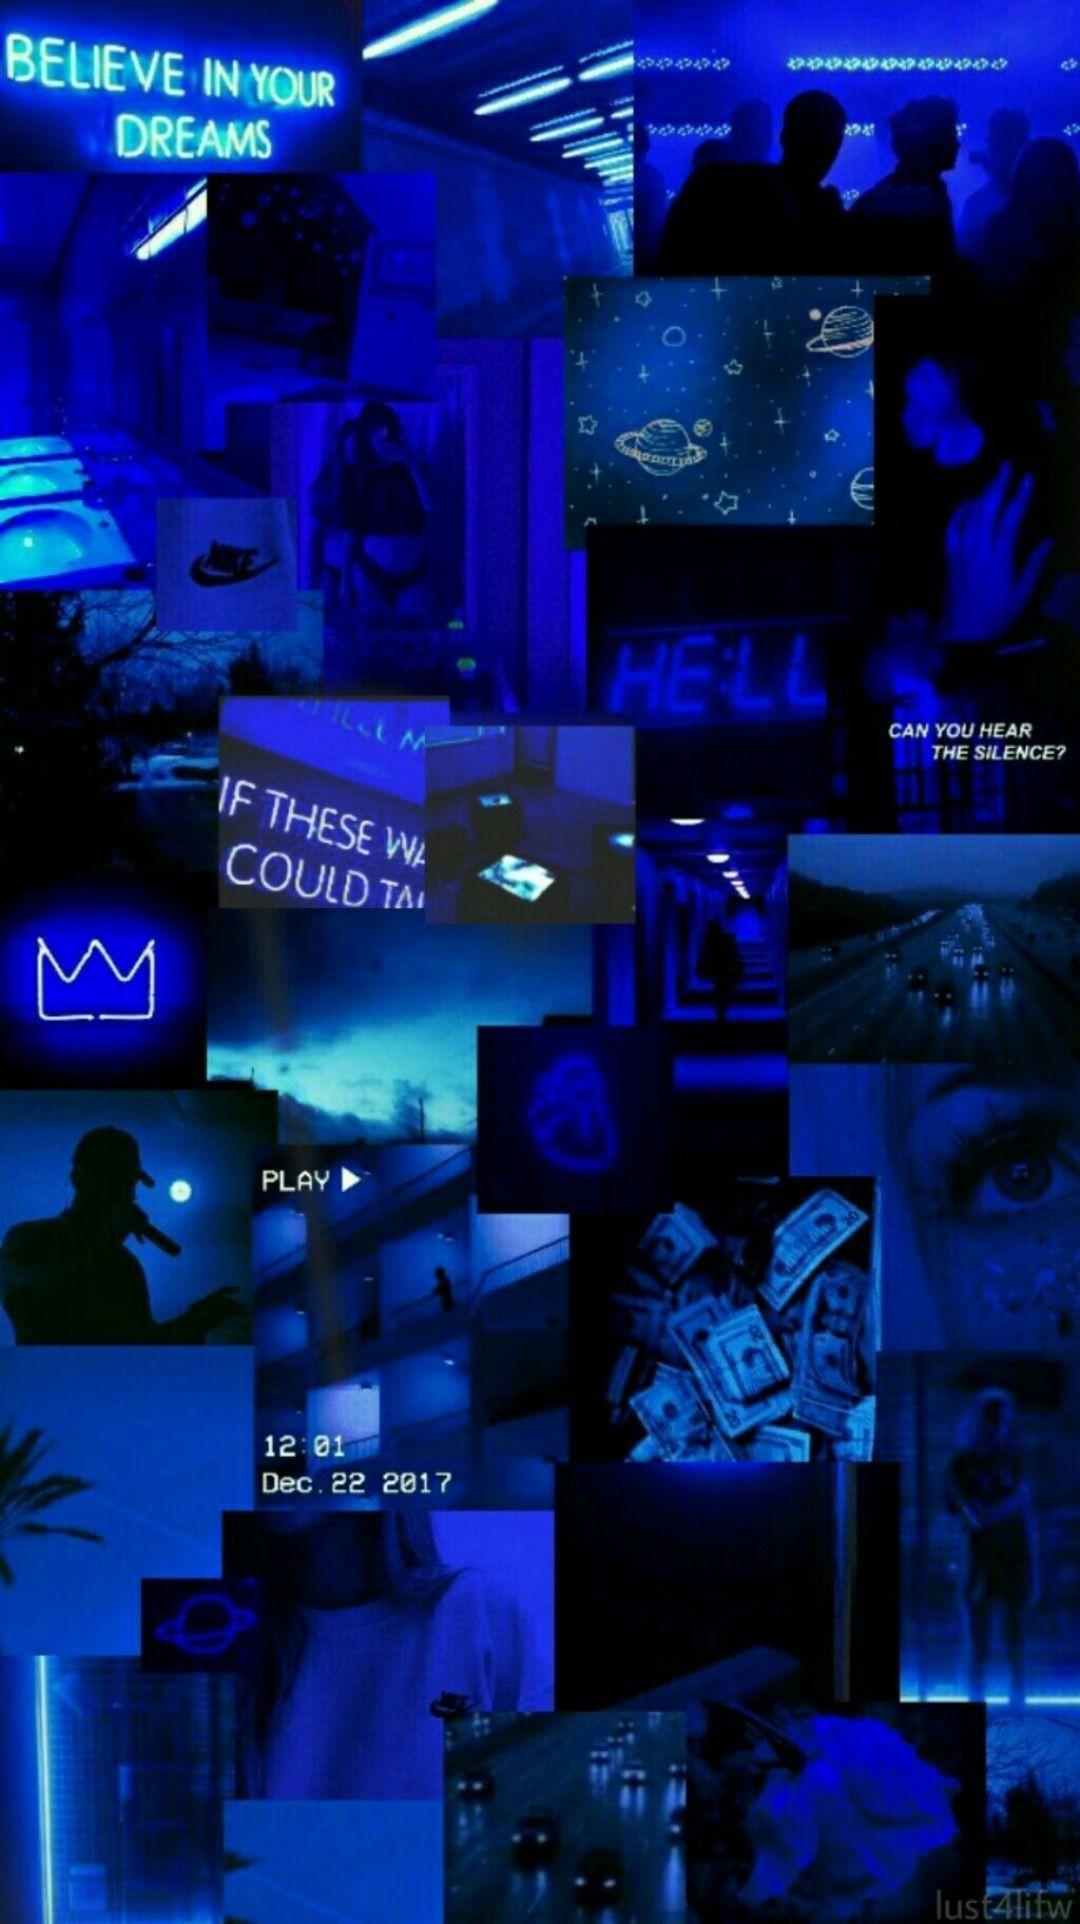 Collage Fondosdepantalla Wallpaper Azul Blueaesthetic